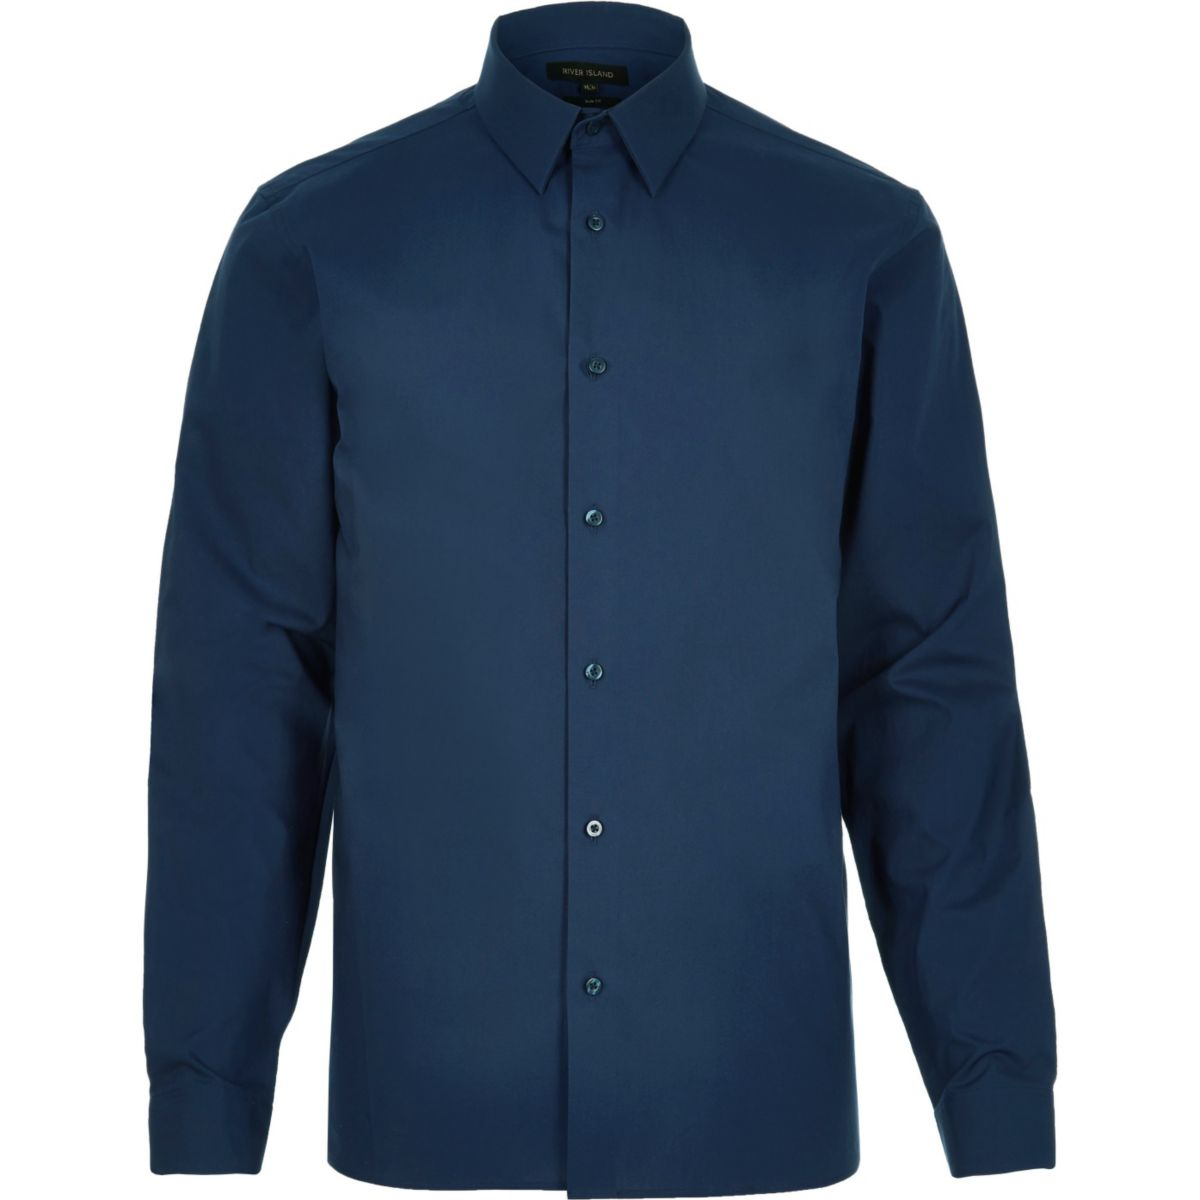 Navy formal slim fit poplin shirt shirts sale men for Mens slim fit formal shirts uk